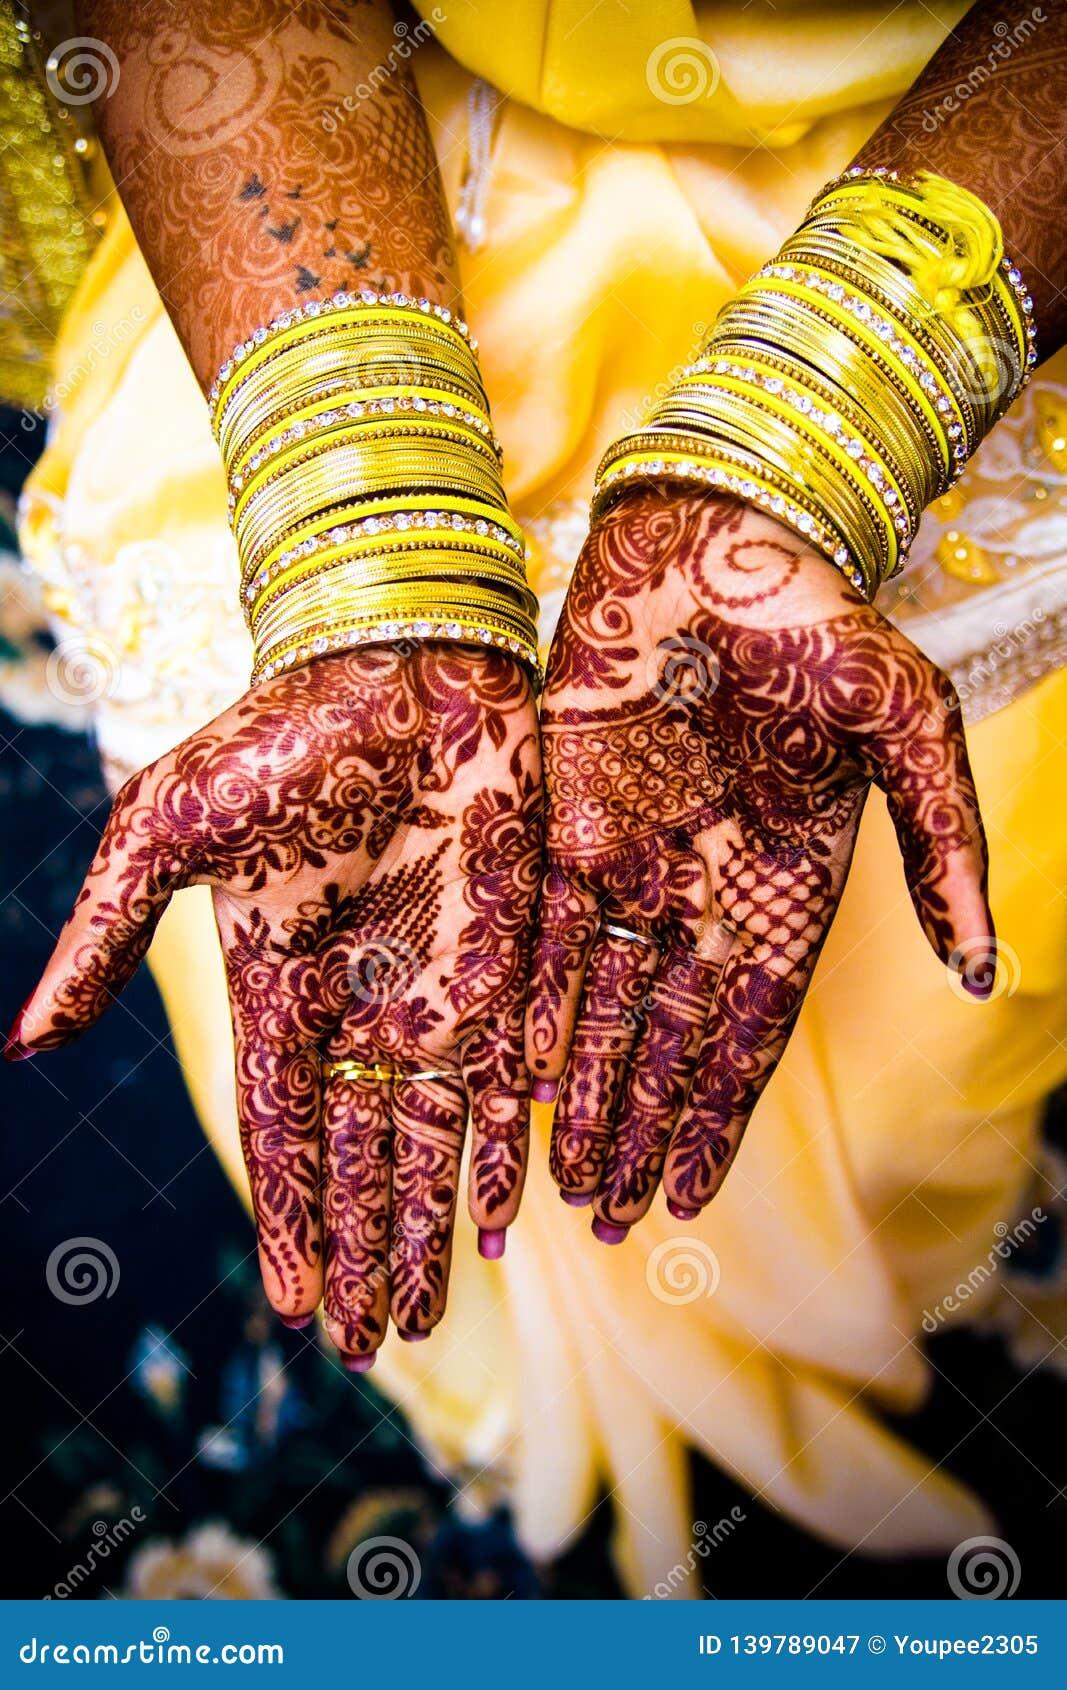 Bride with mehendi